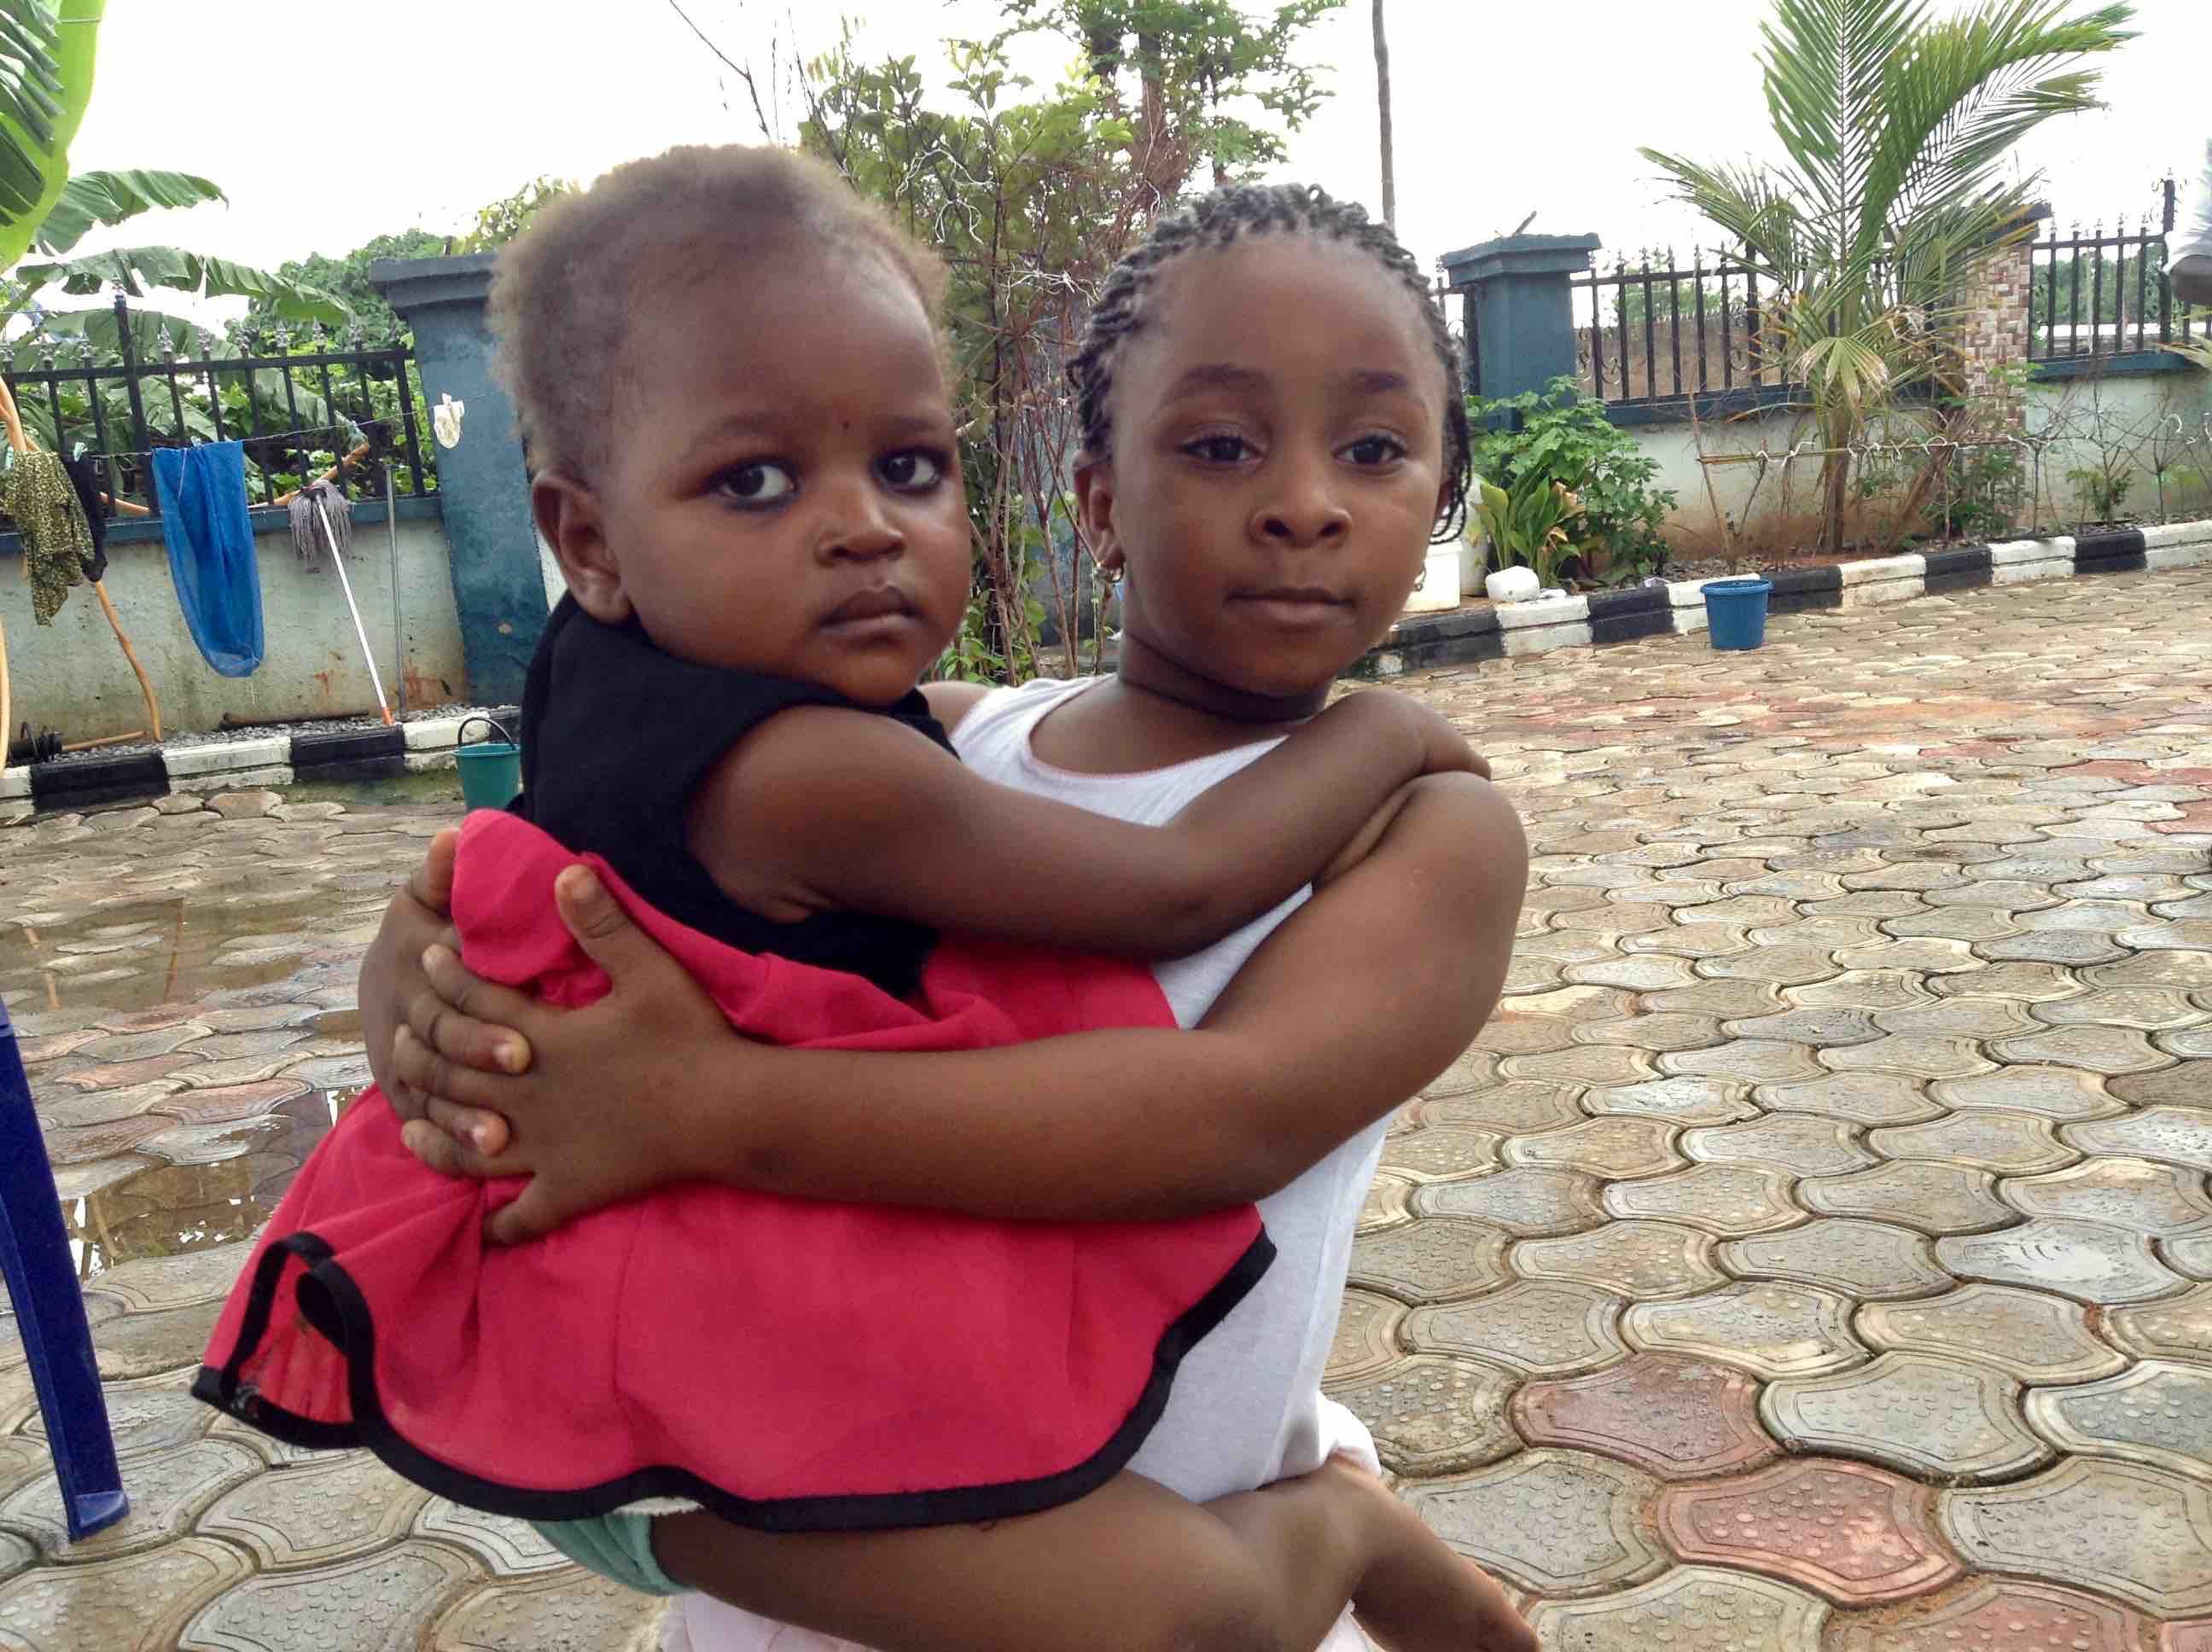 Children in Lafia, Nasarawa State, Nigeria. #JujuFilms